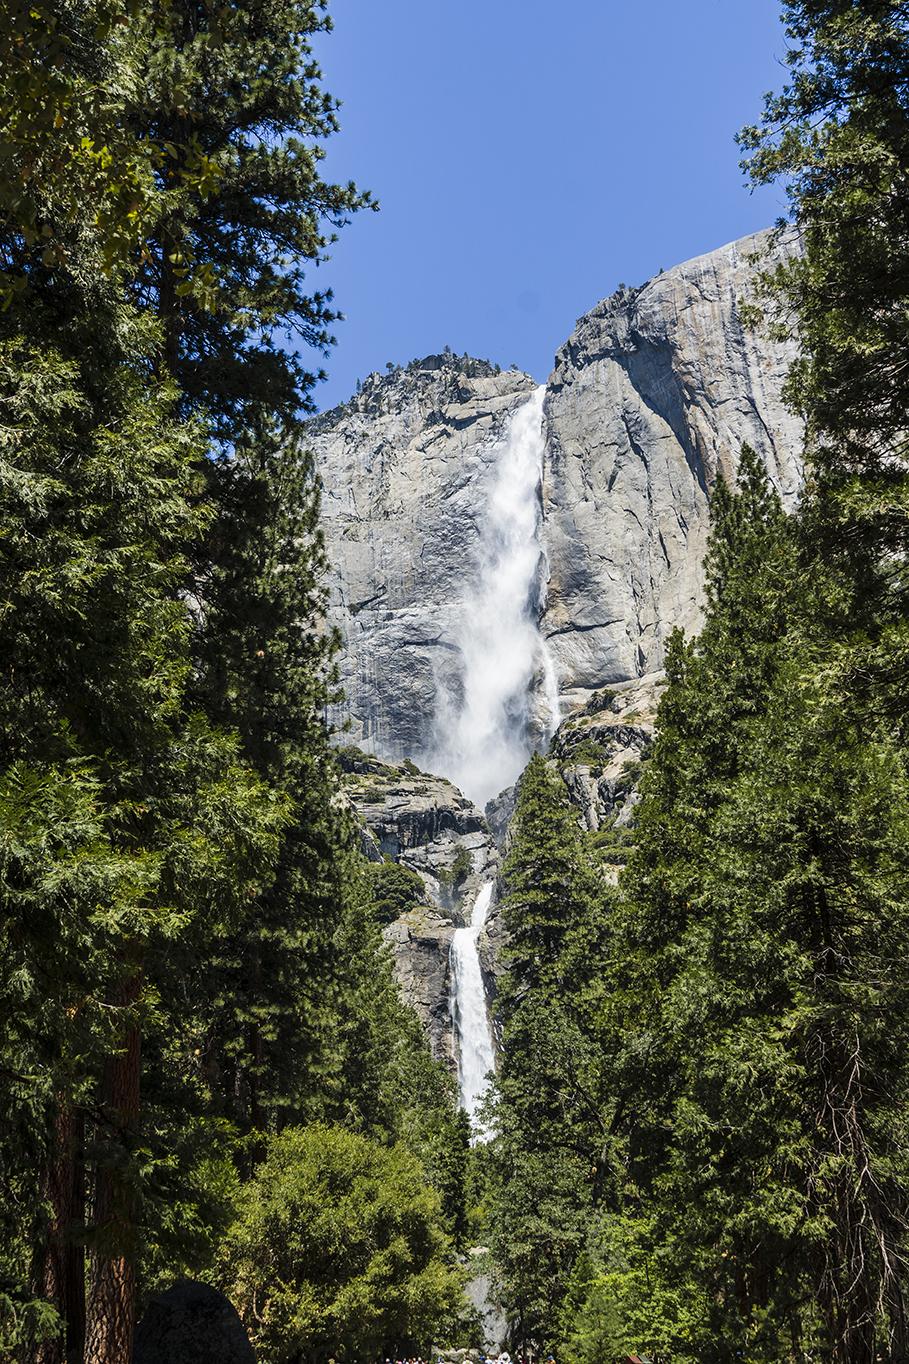 Lower Yosemite Falls in Yosemite valley California